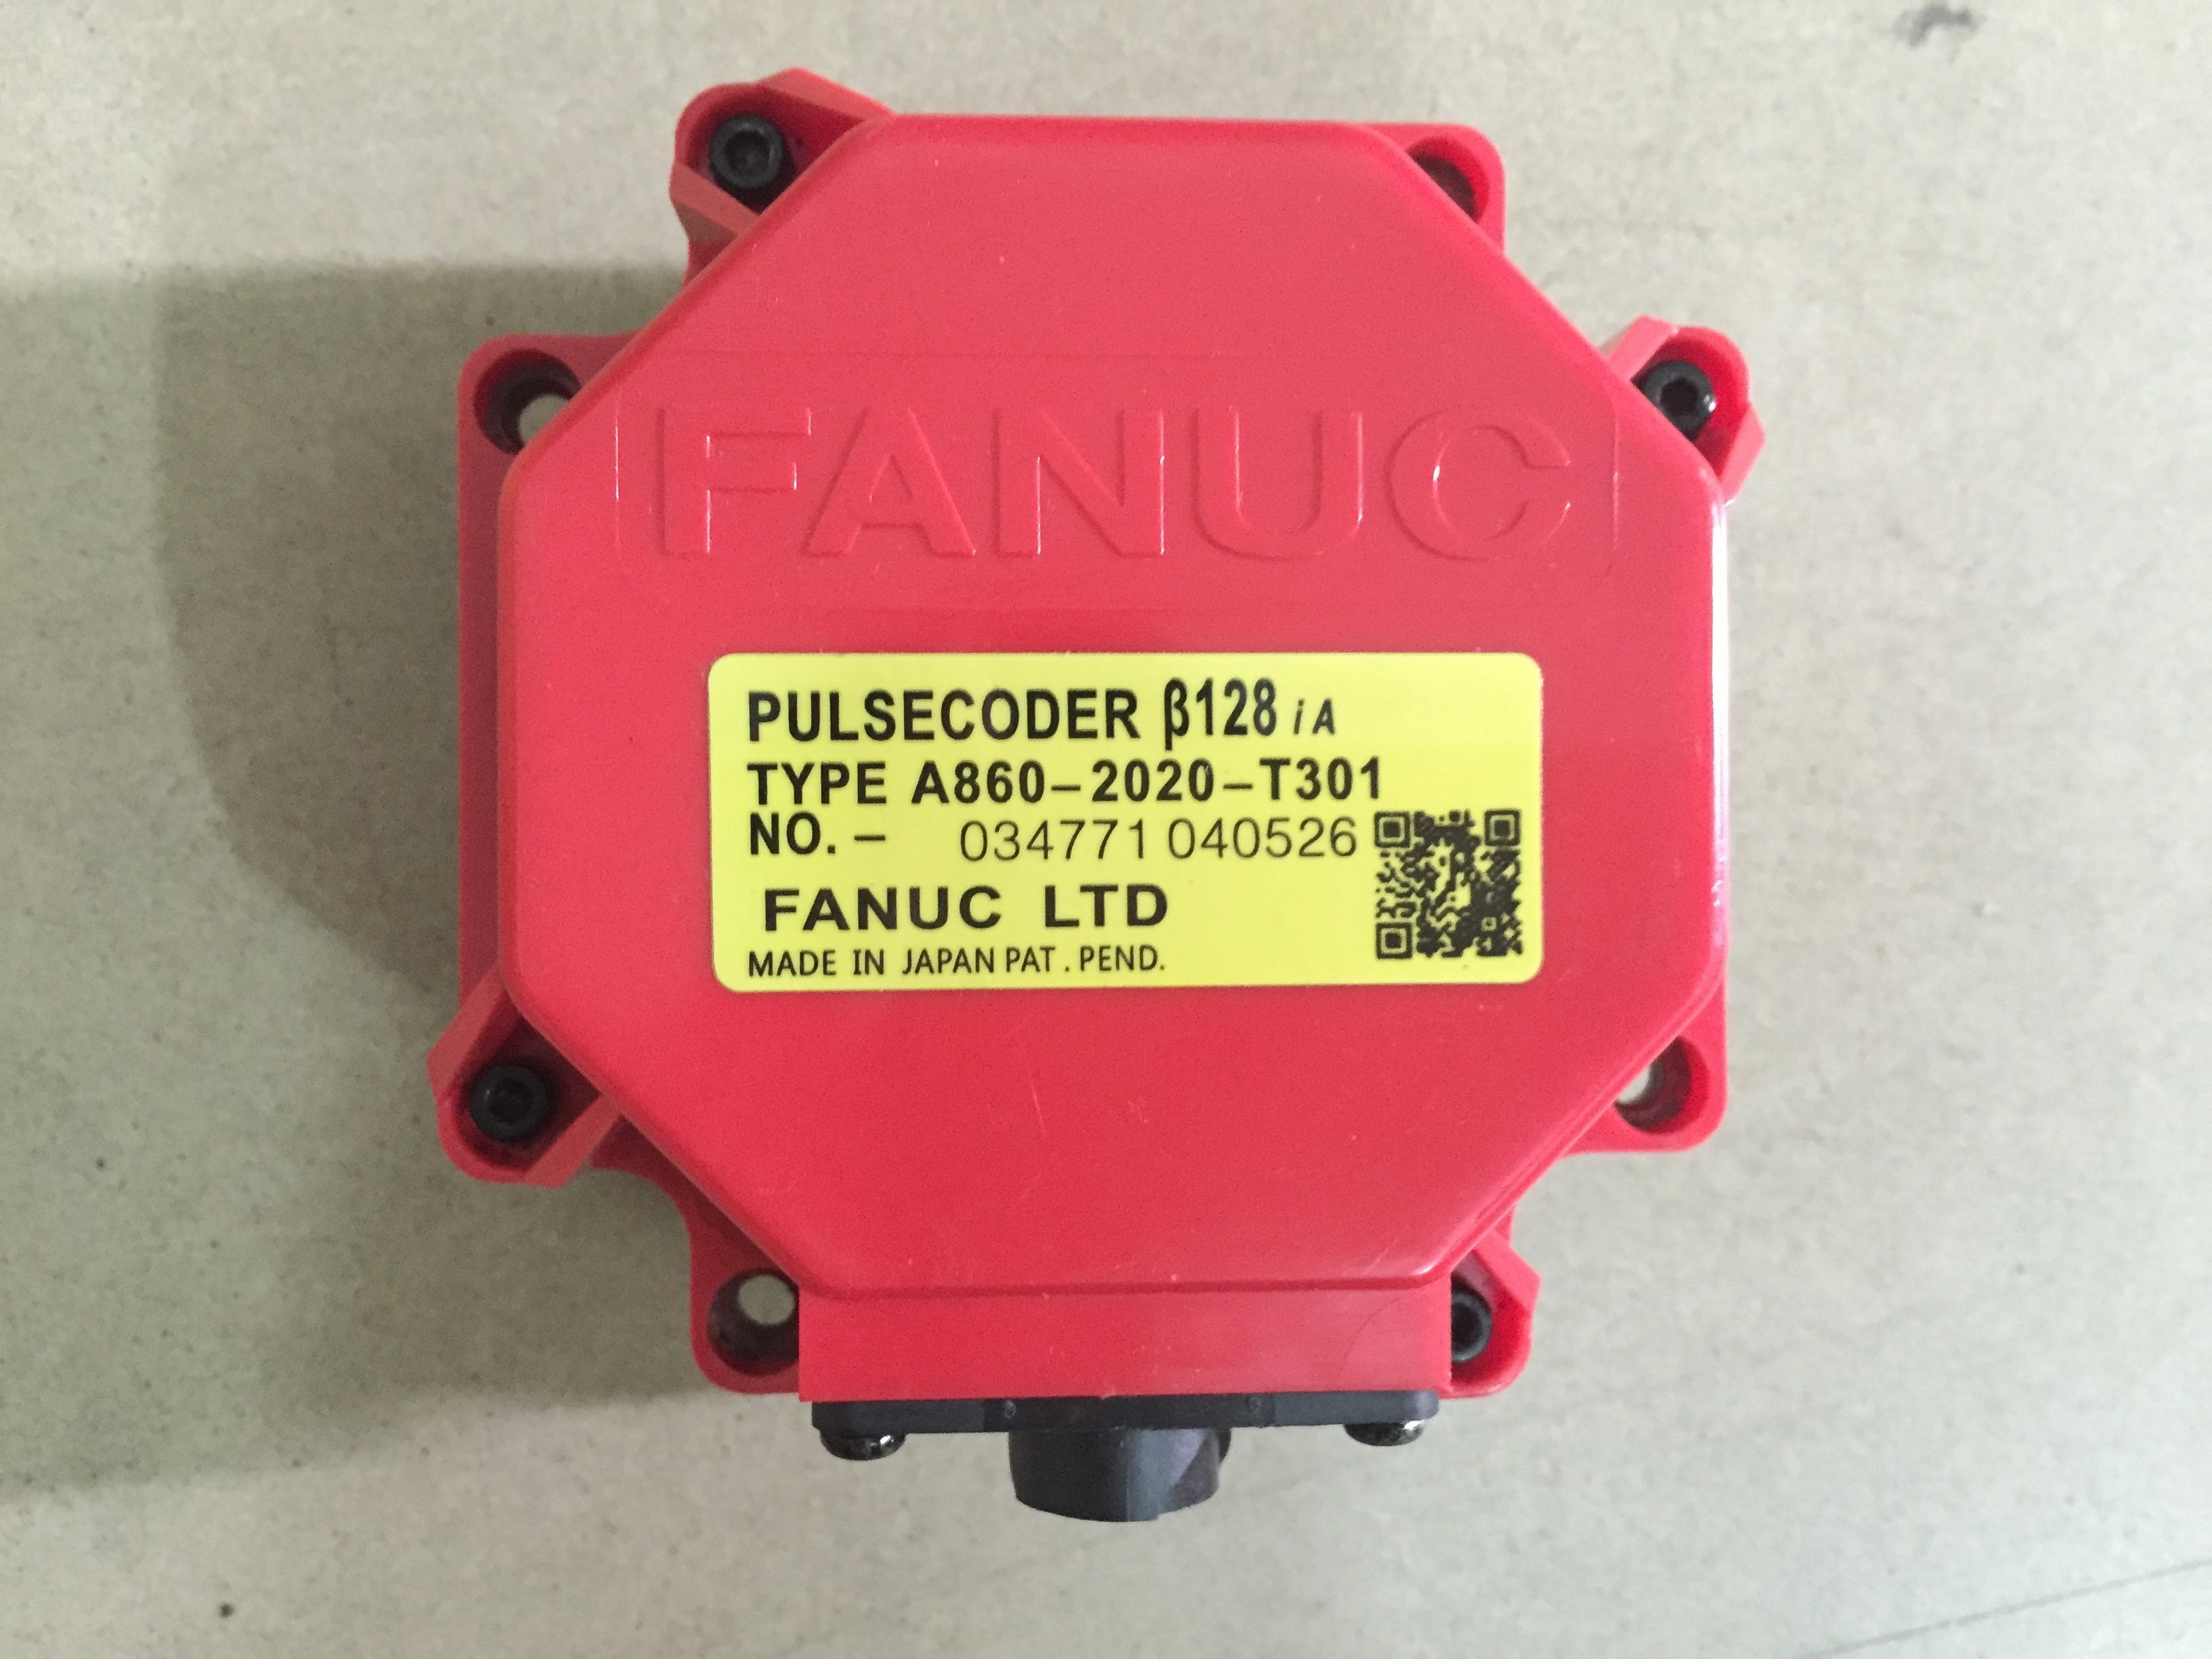 A860-2020-T301 FANUC编码器 公司大量现货低价供应日本法那科(FANUC)各类电机编码器,欢迎来电咨询!(附FANUC编码器表) 佛山市创驰机电设备有限公司 是一家专门从事日本法那科( FANUC )及三菱( MITSUBISHI )数控机床控制系统配件销售,同时为客户提供数控设备的维修的大型综合性公司! A860-2020-T301 FANUC编码器